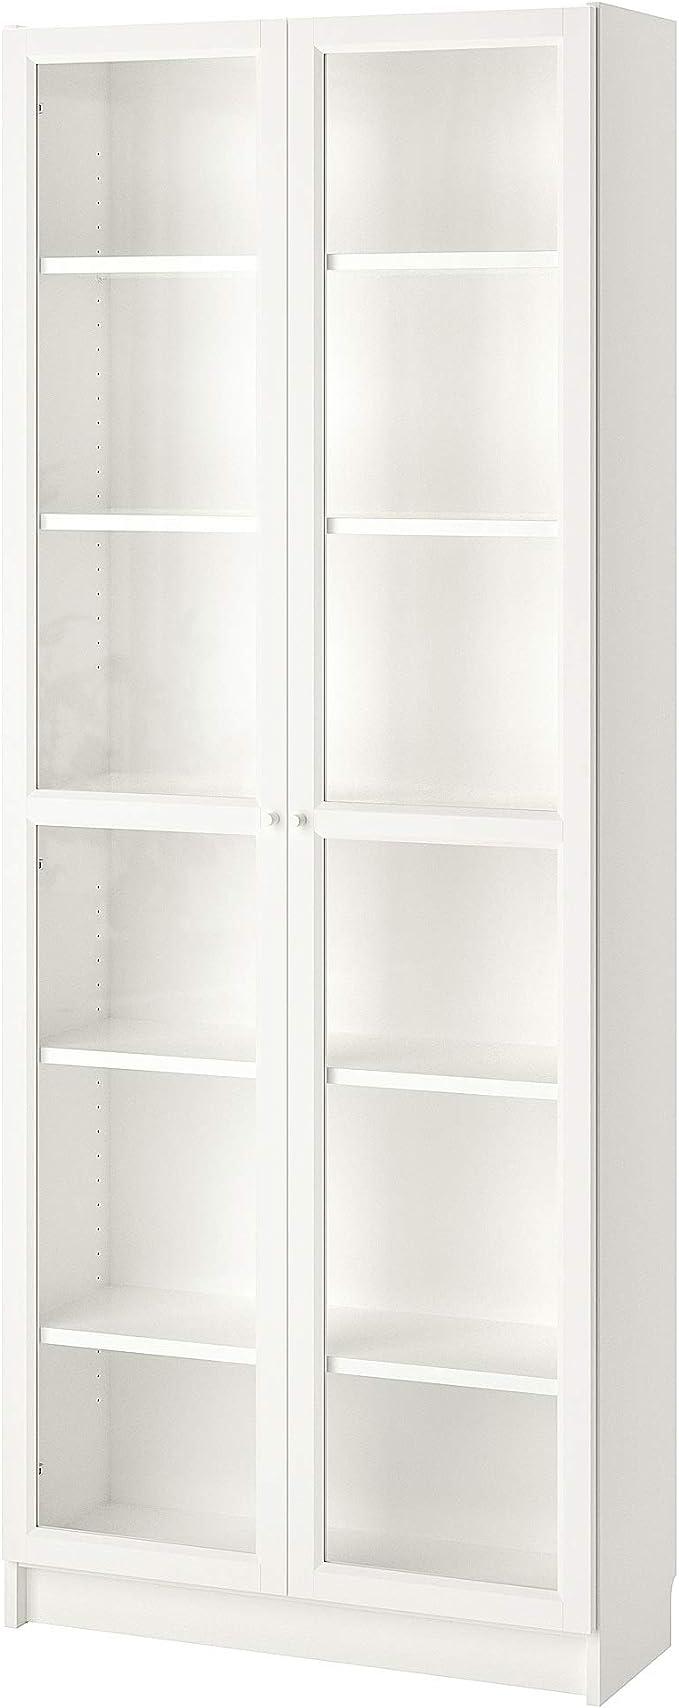 IKEA BILLY/OXBERG estantería 80x30x202 cm blanco ...